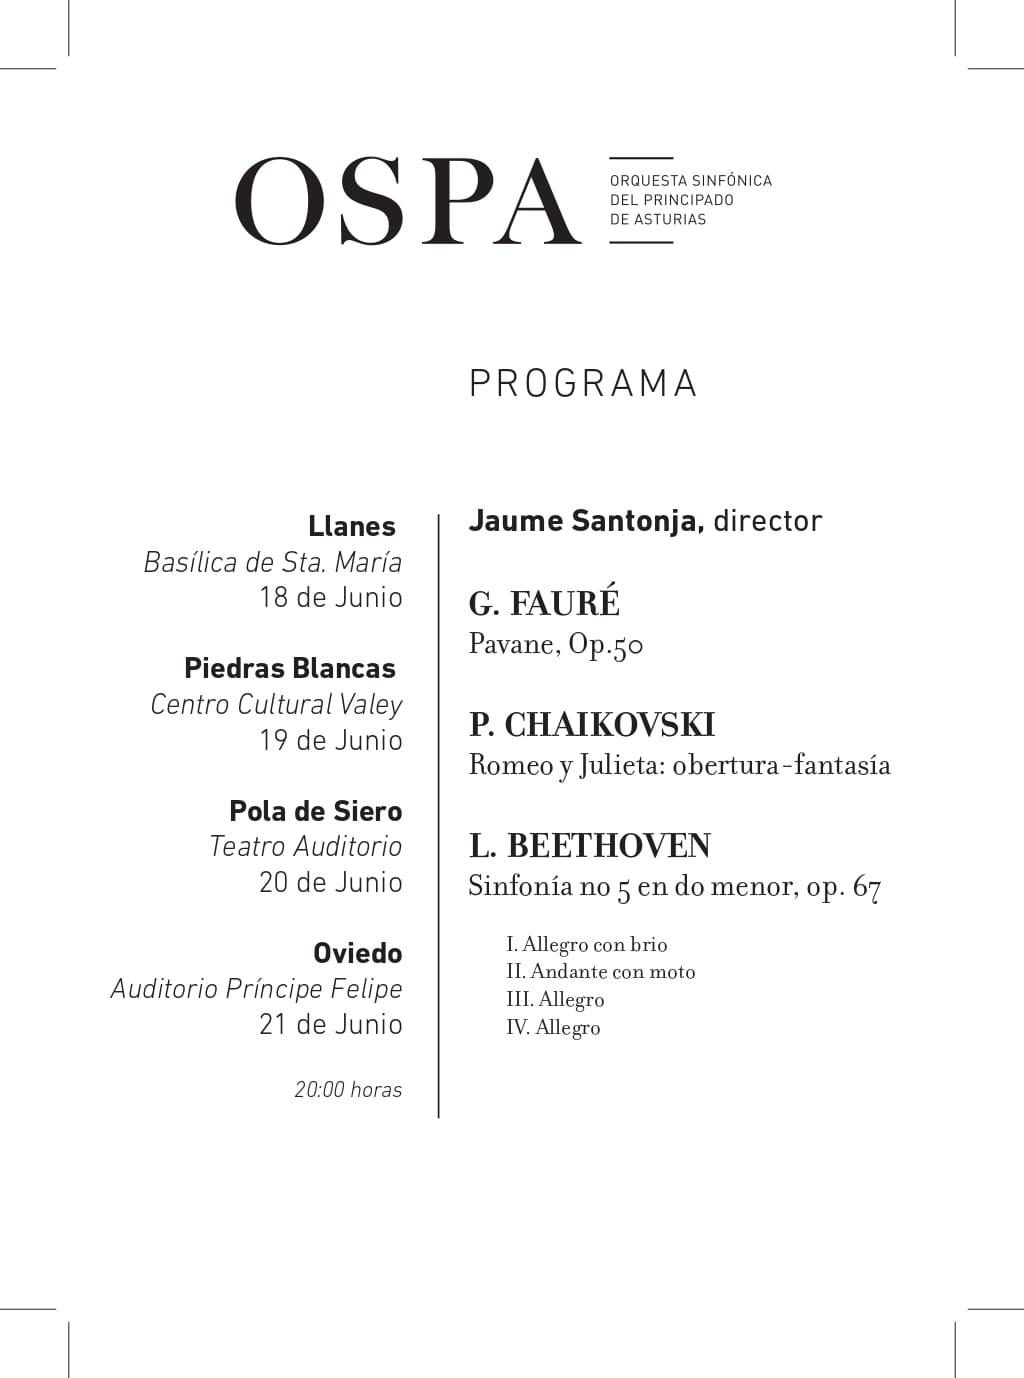 programa concierto ospa